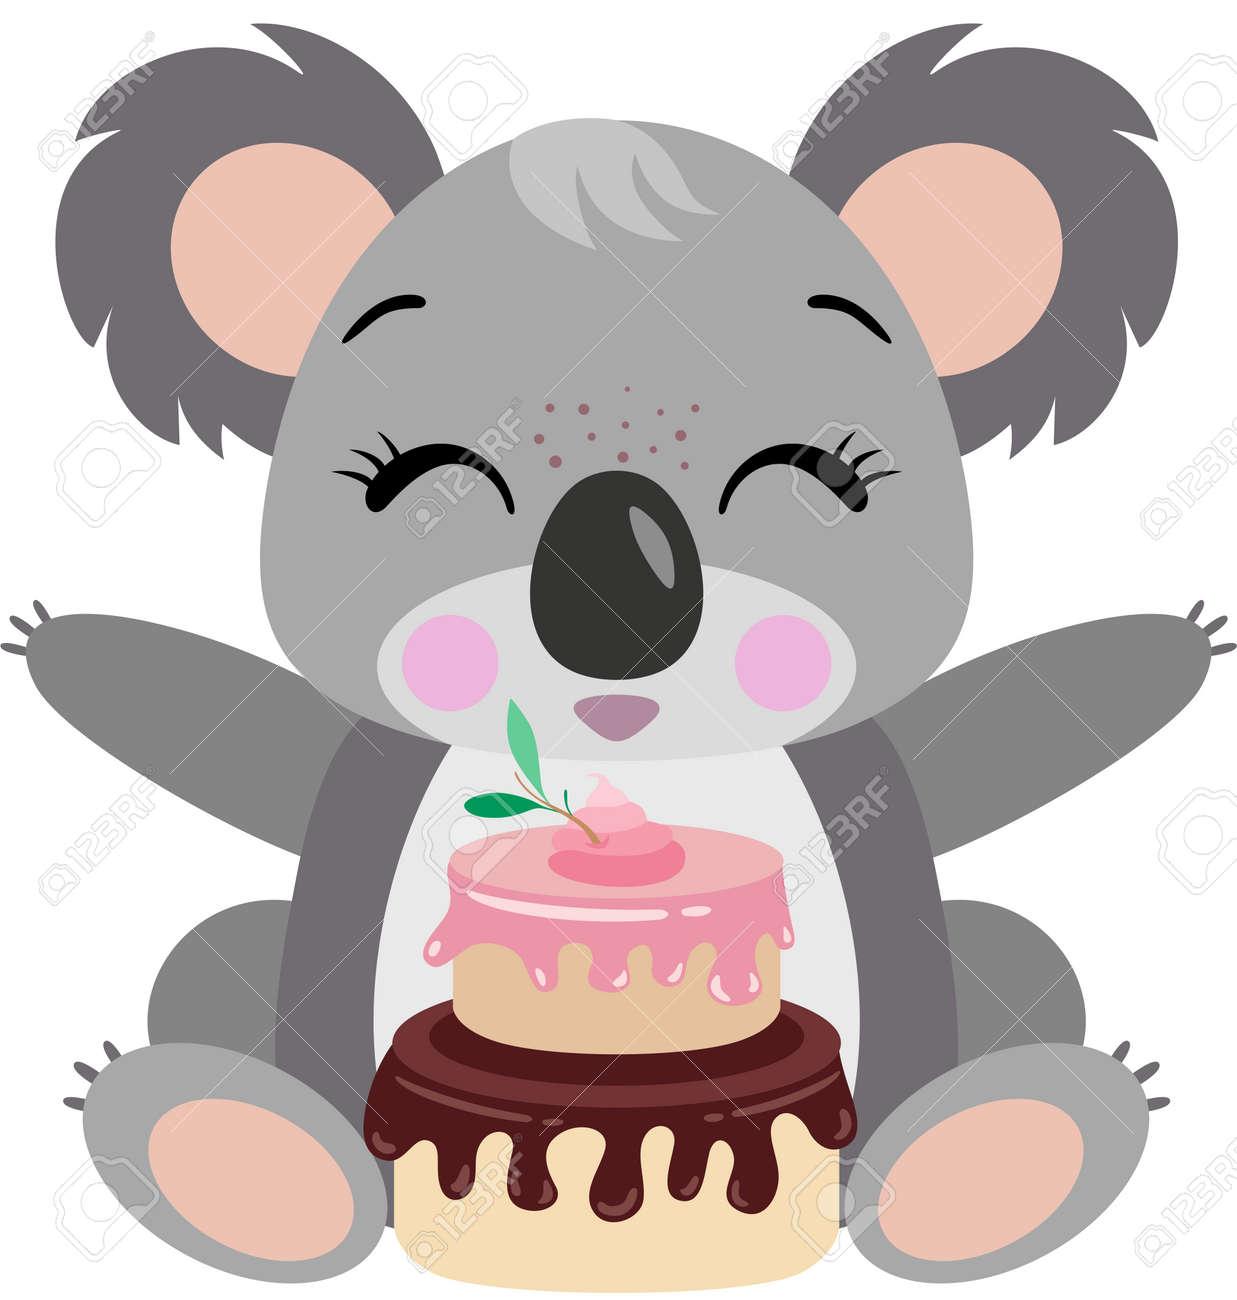 Astonishing Happy Koala With Birthday Cake Royalty Free Cliparts Vectors And Funny Birthday Cards Online Hetedamsfinfo